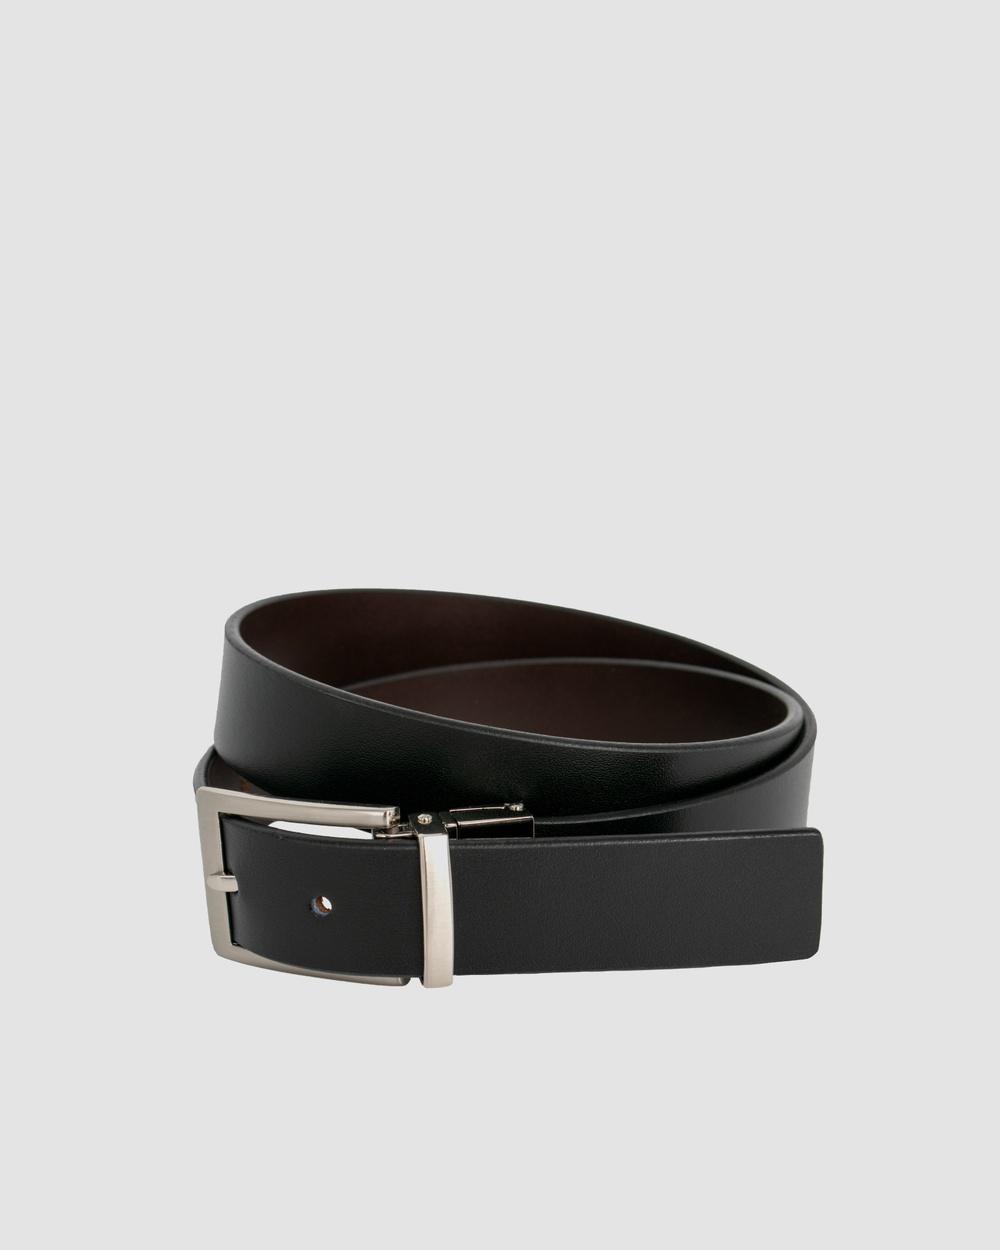 Loop Leather Co Sandwich Guy Reversible Belts Black & Choc